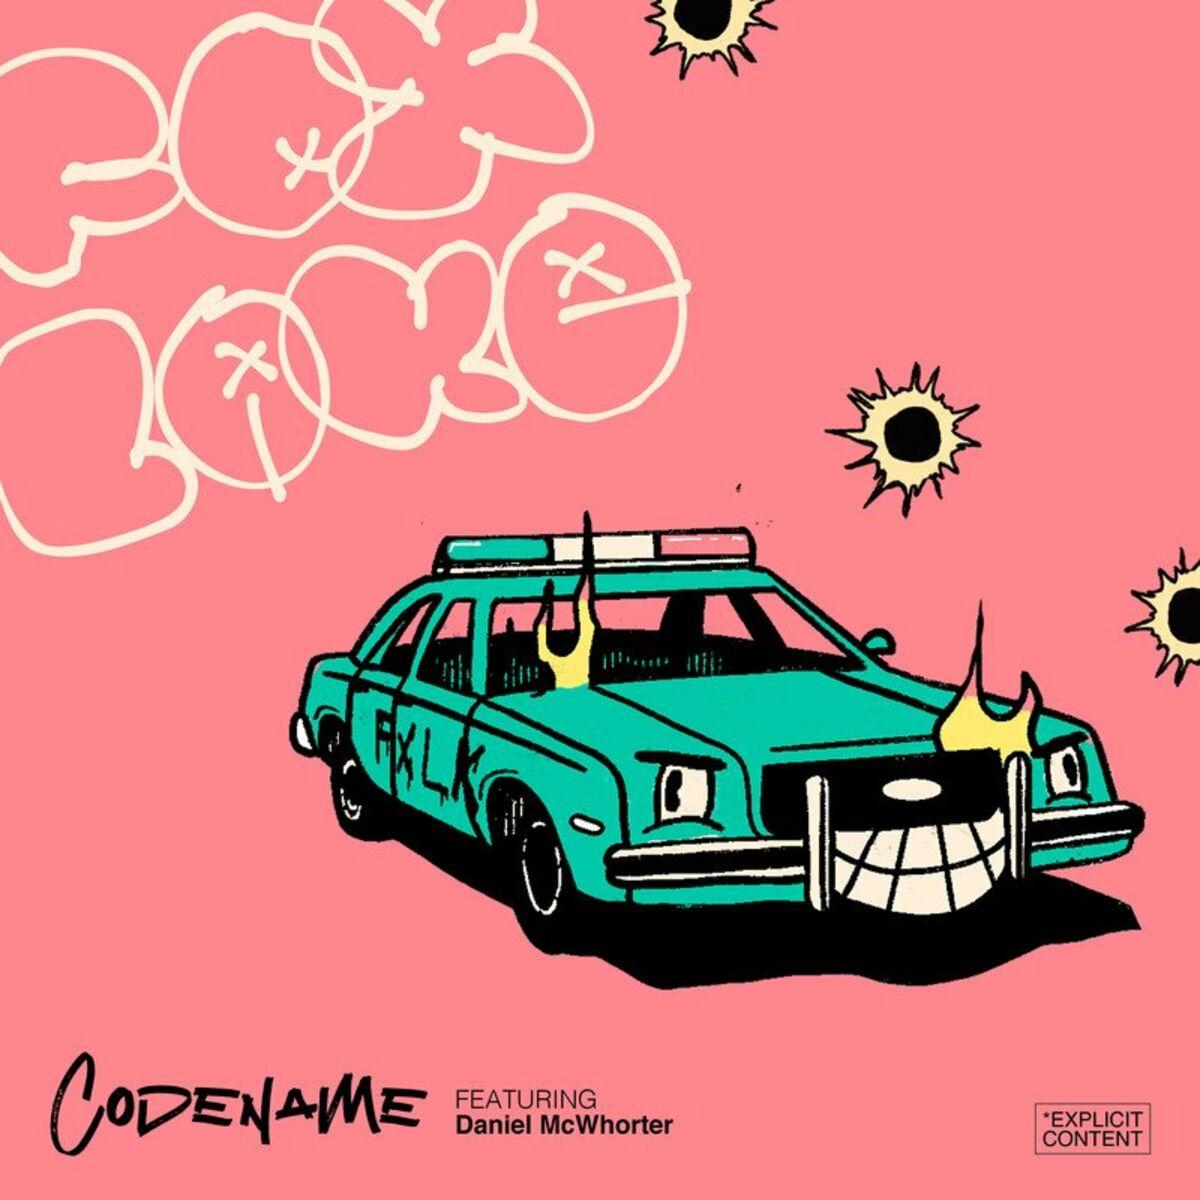 Fox Lake - Codename [single] (2020)